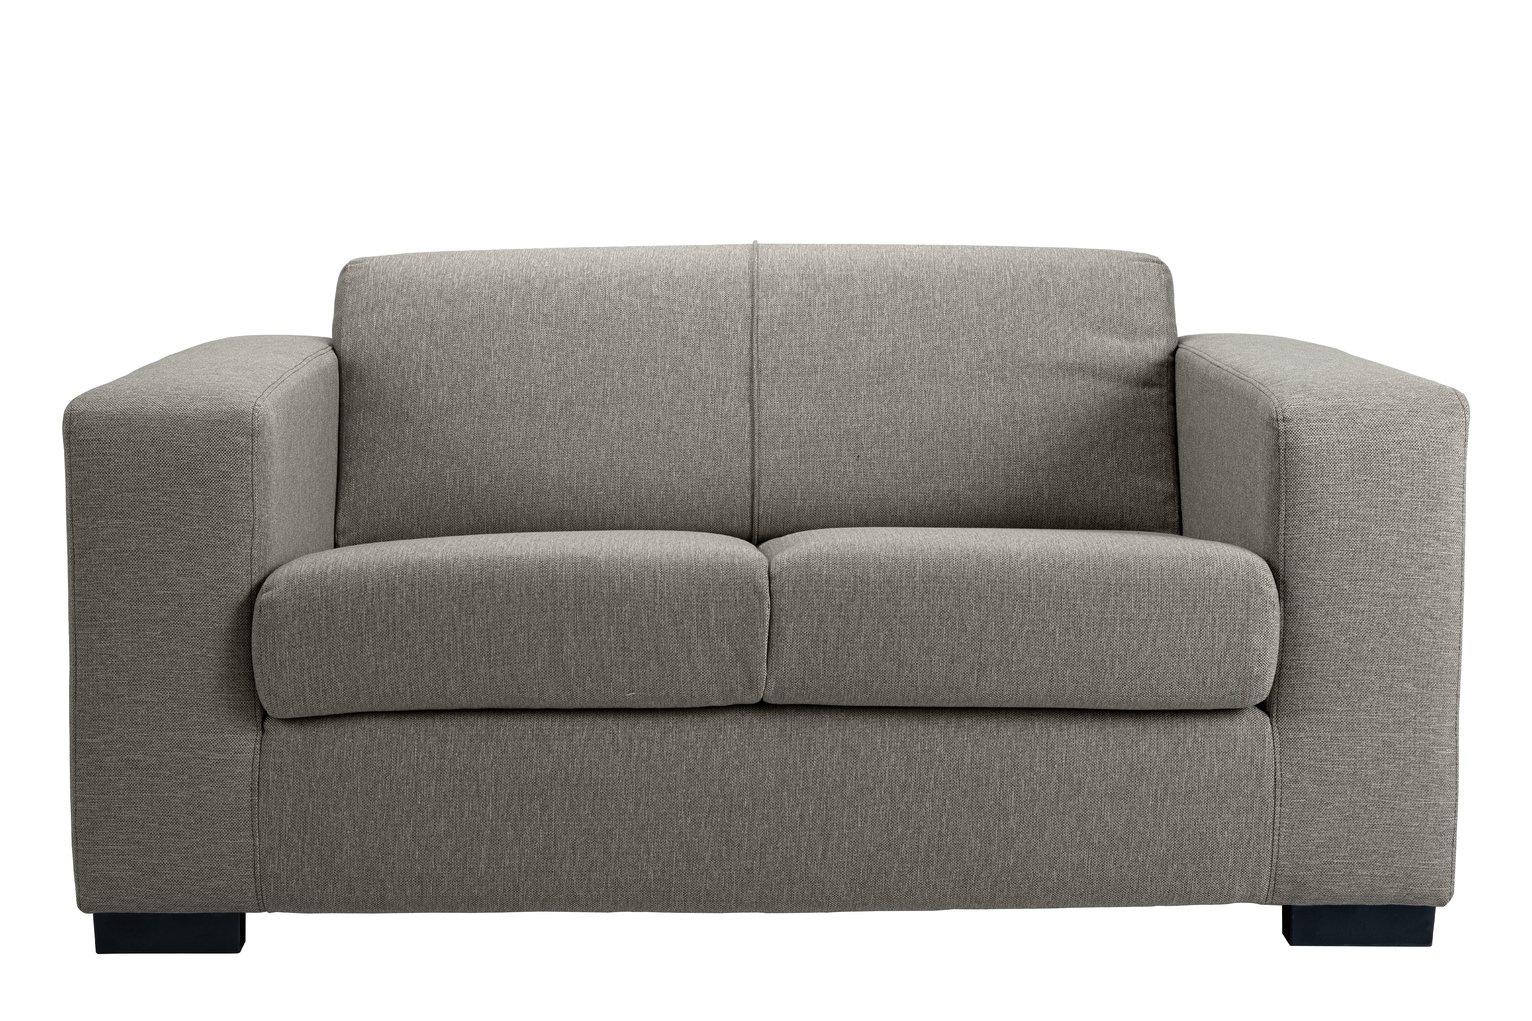 Habitat Ava Compact 2 Seater Fabric Sofa - Light Grey